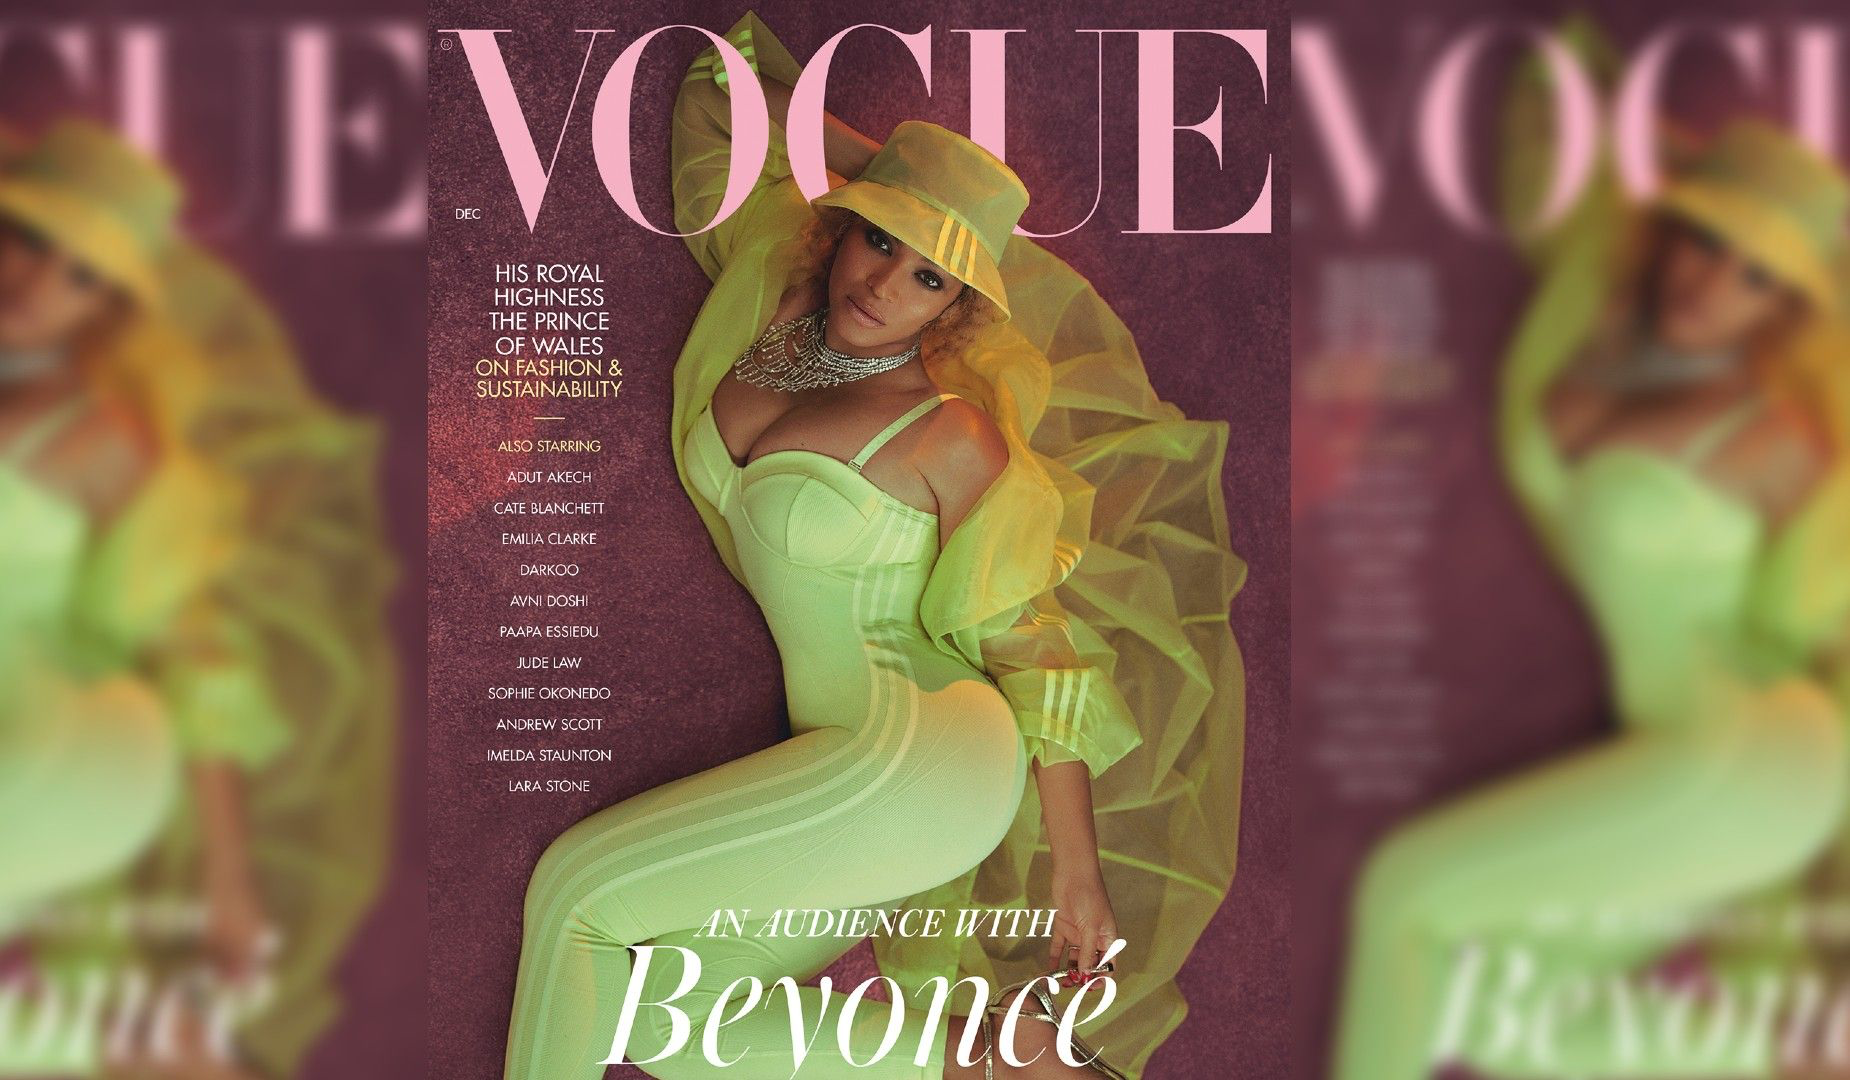 21-річна студентка стала наймолодшою фотографкою British Vogue